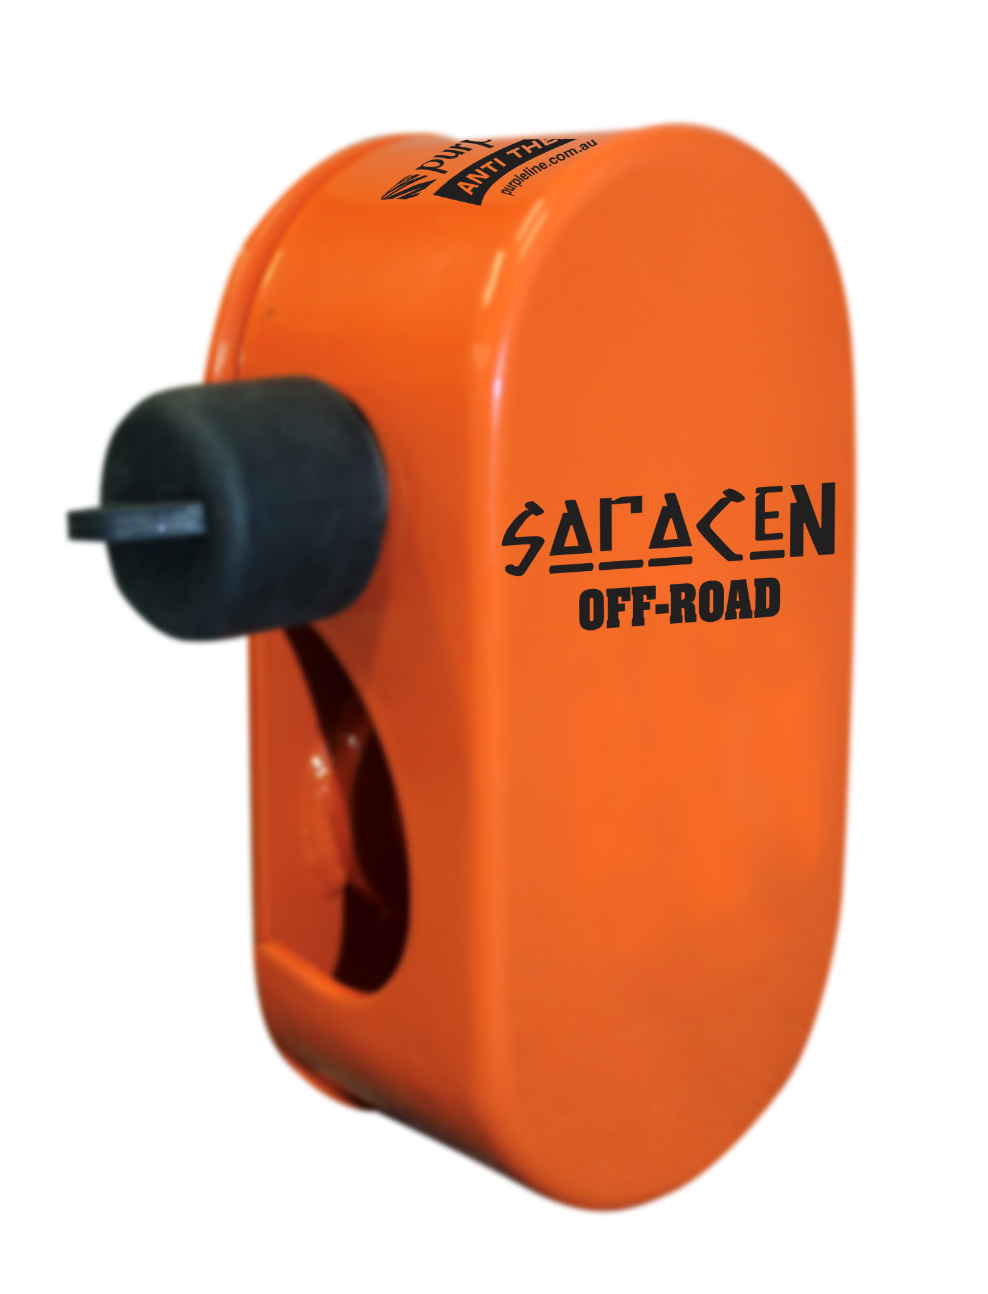 Saracen Off-Road Hitch Lock Fits DO35 V1-V2-V3